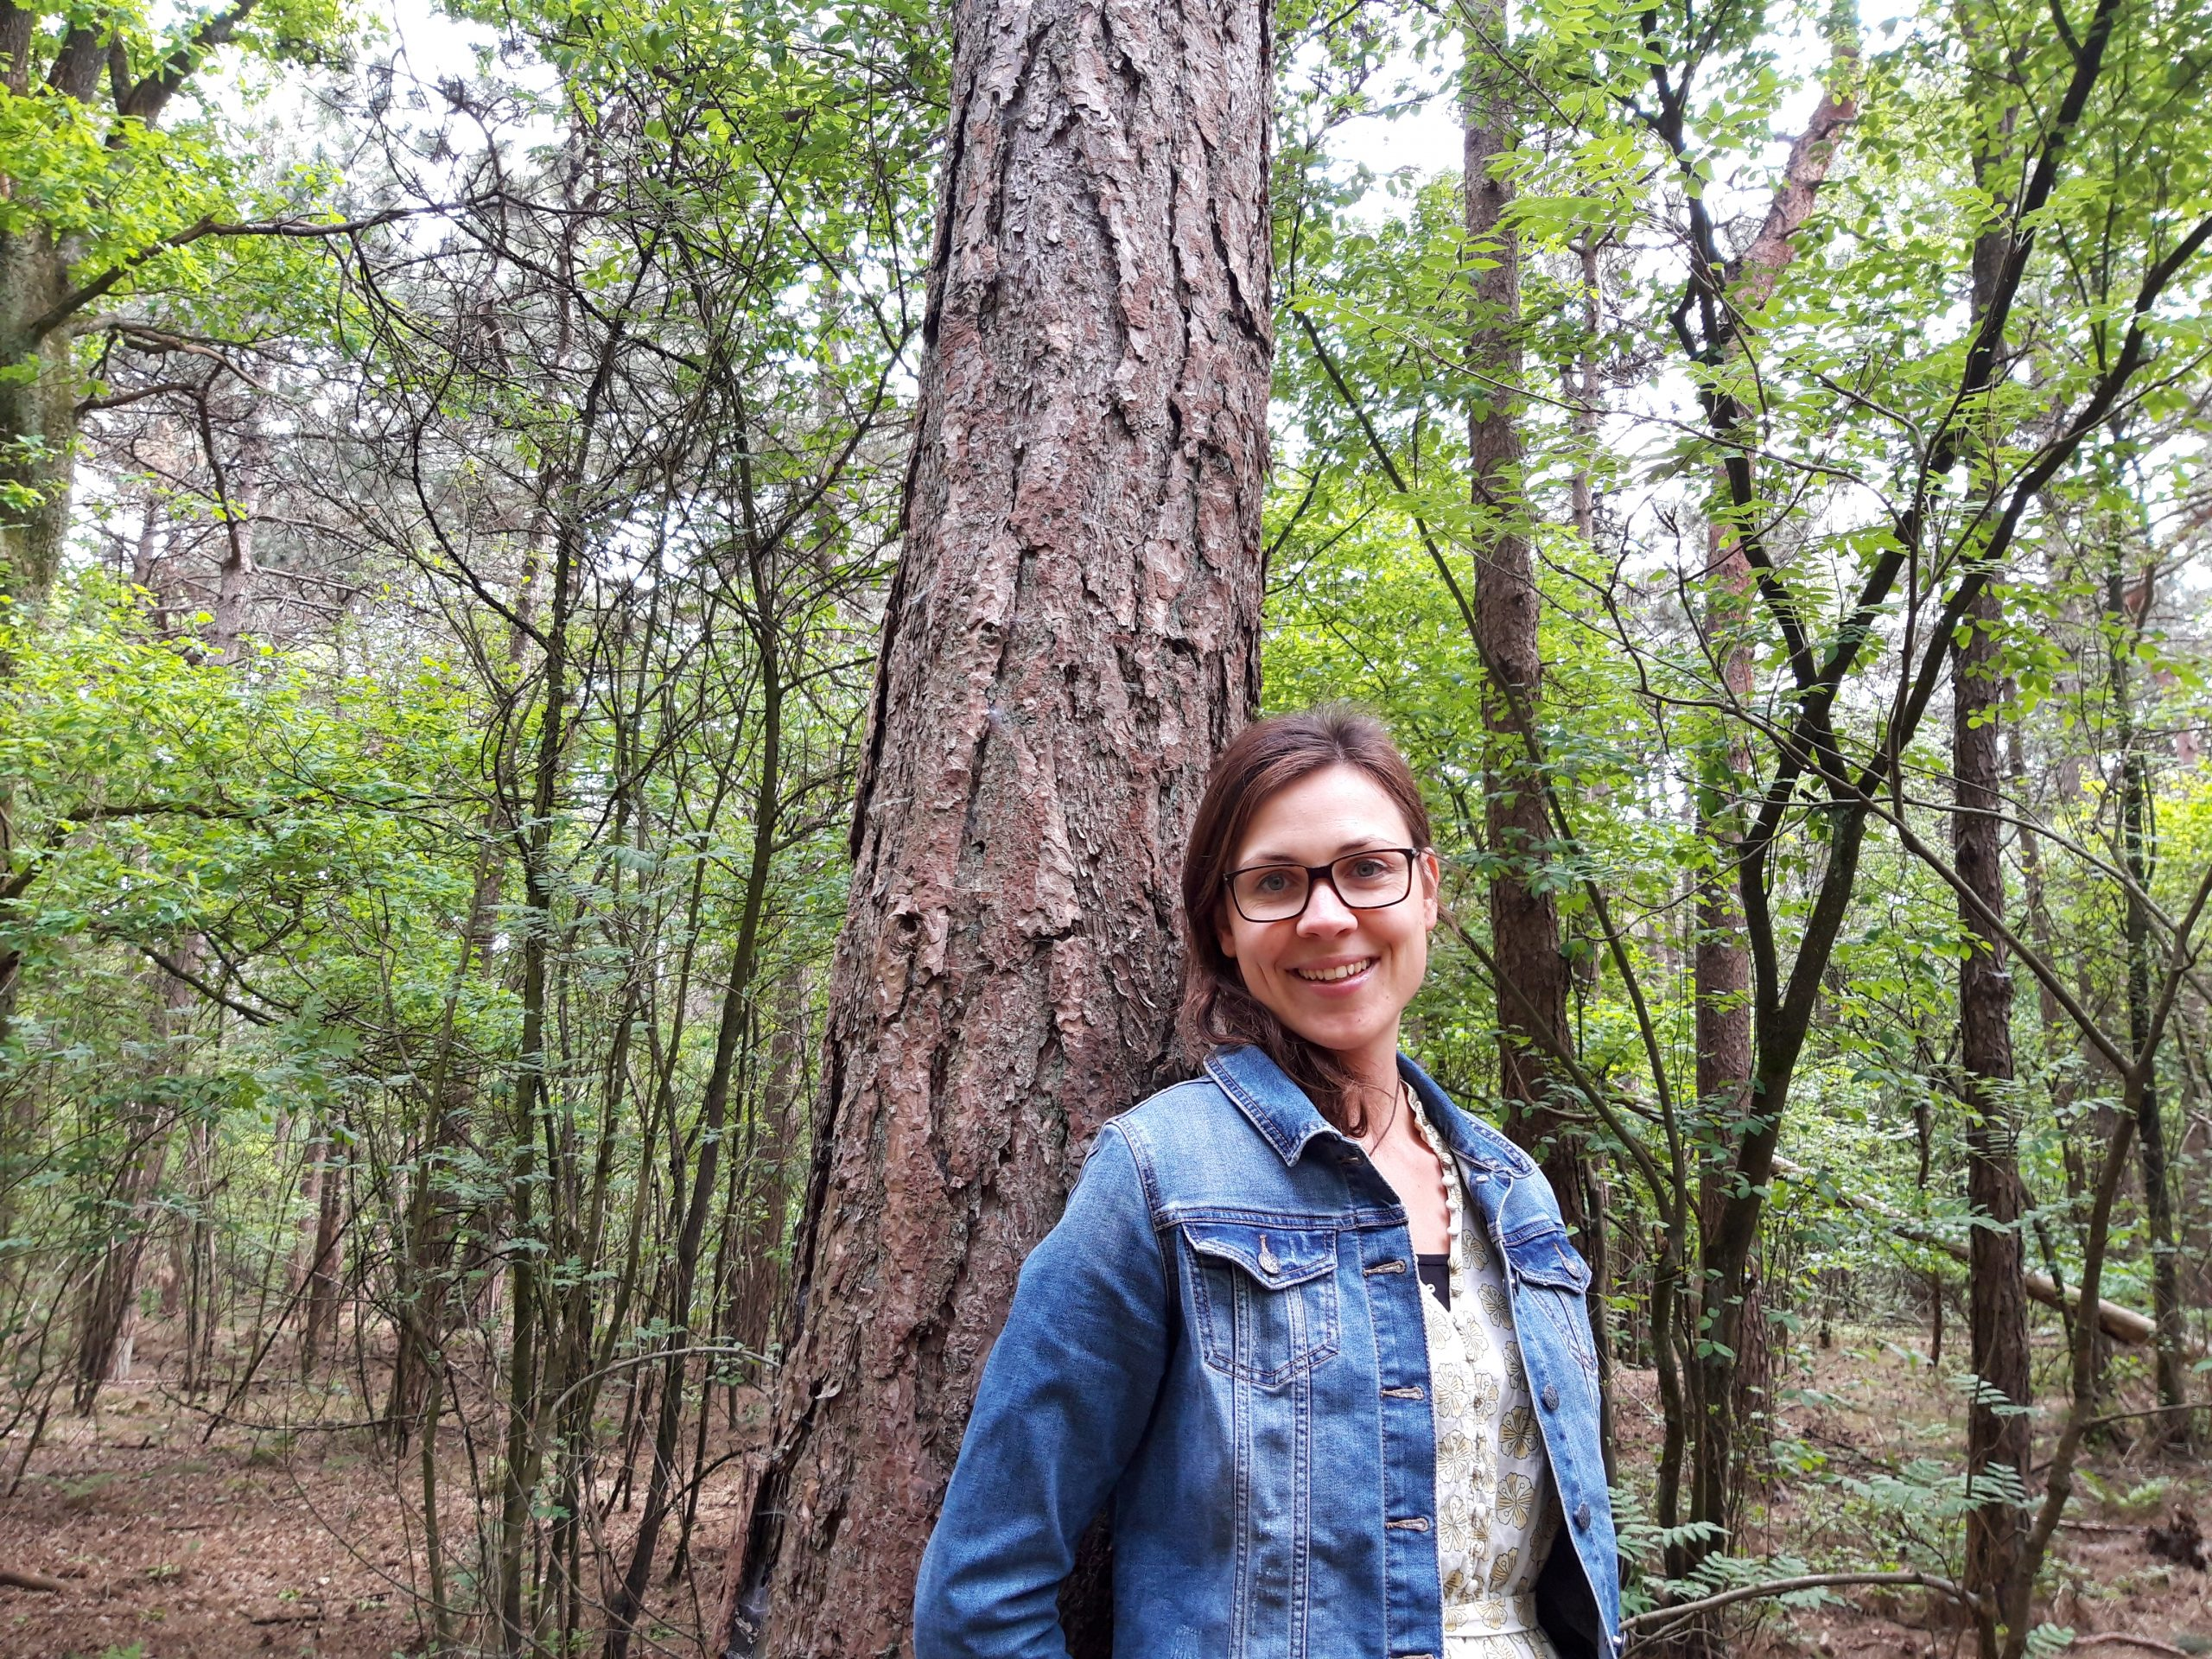 wandelcoach natuur inspiratie wandelen podcasts interiews lichtpuntjes groen